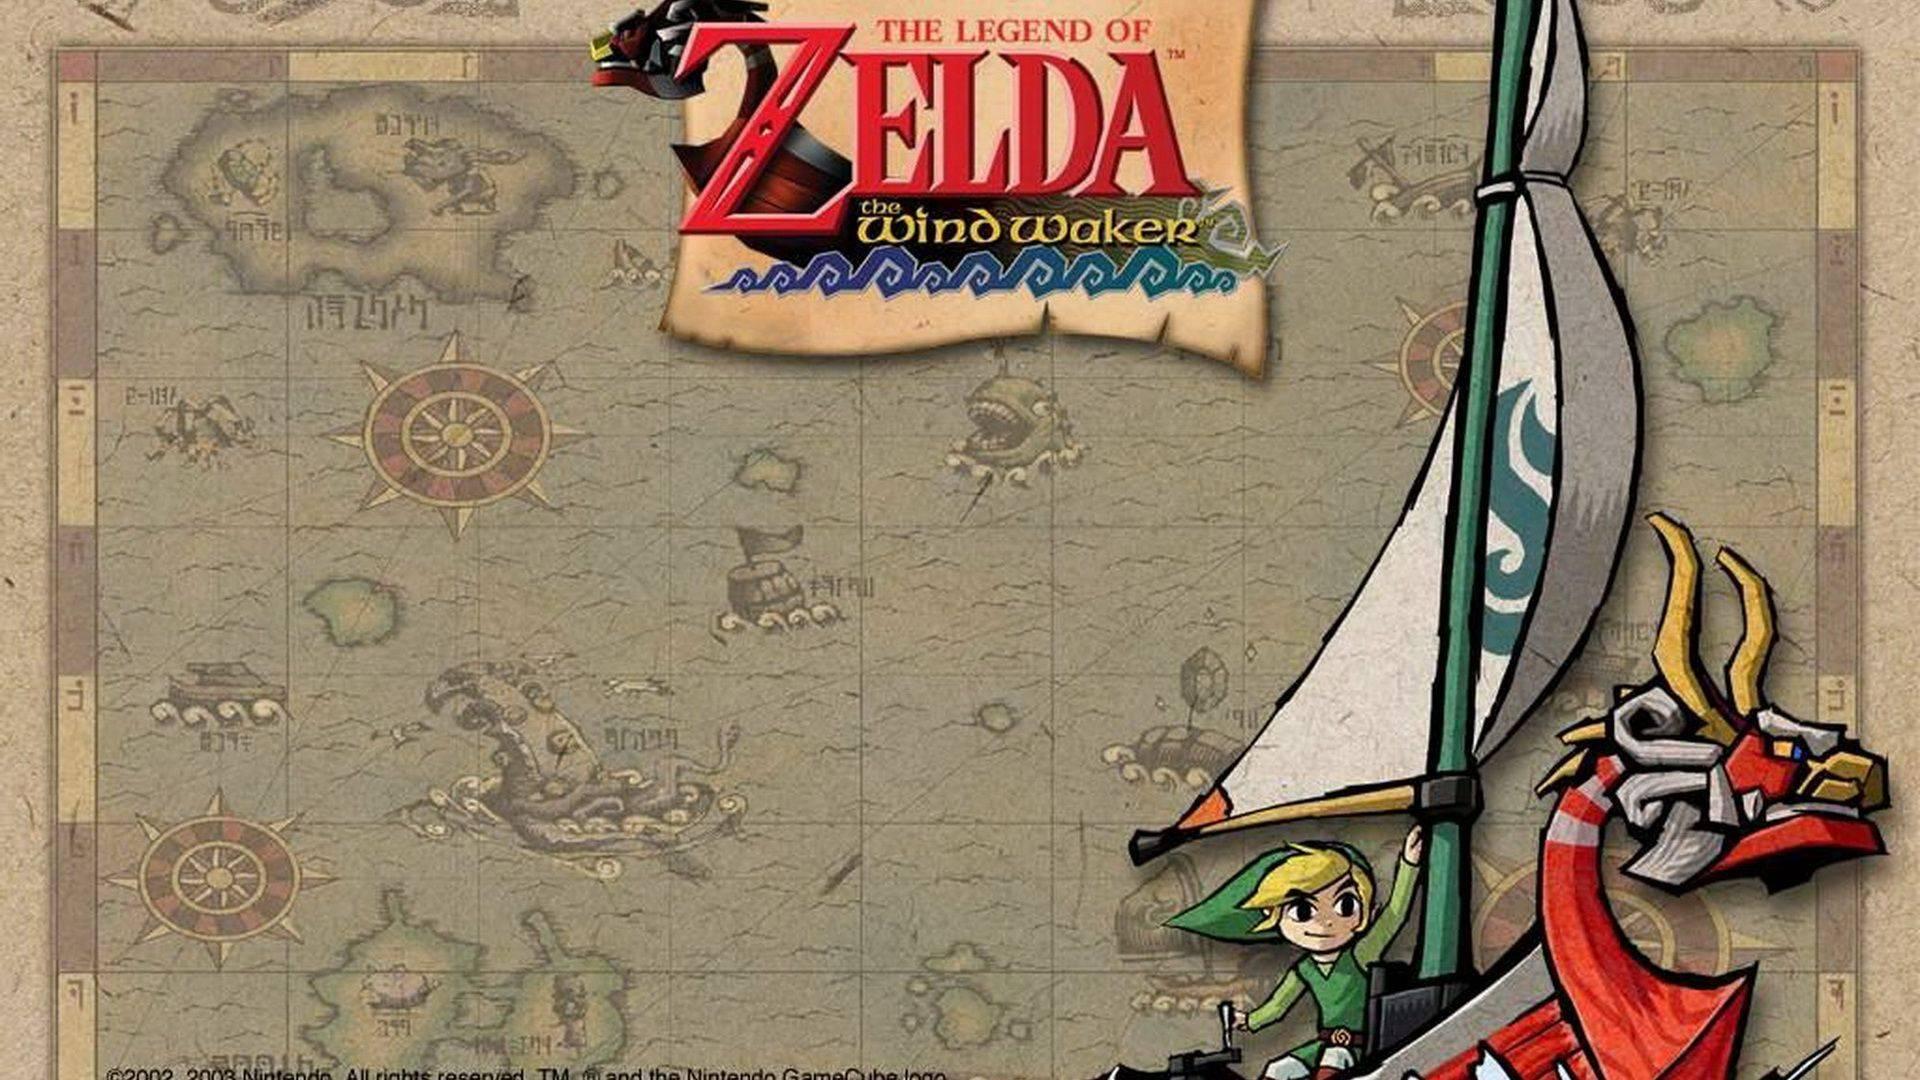 The Legend of Zelda Wind Waker HD Wii U Wallpapers